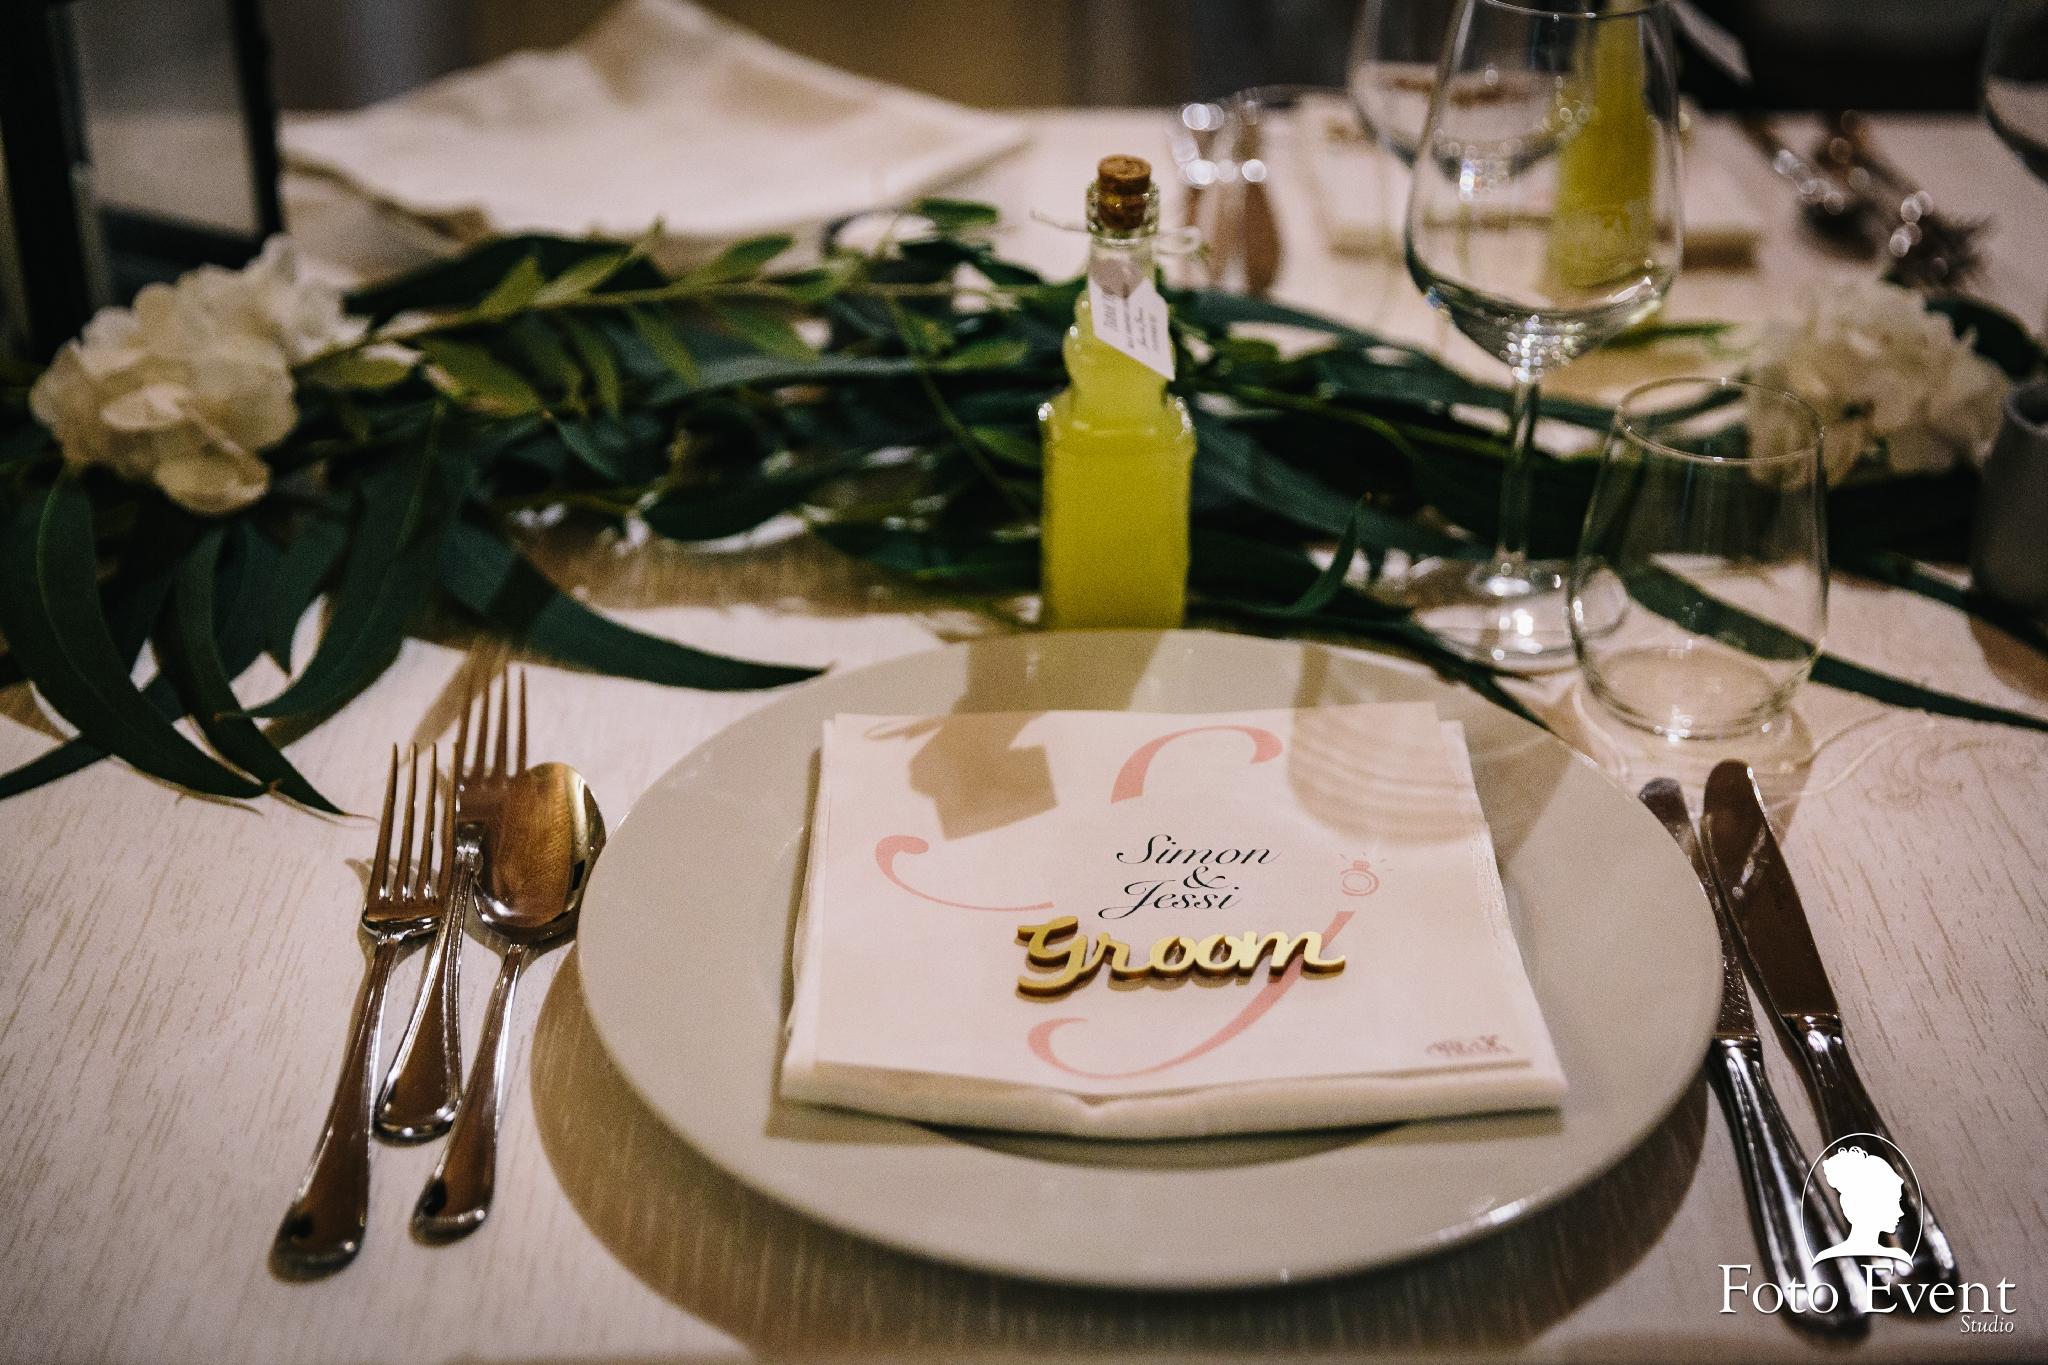 2018-09-25 Matrimonio Jessi e Simon Milligan 5DE 602